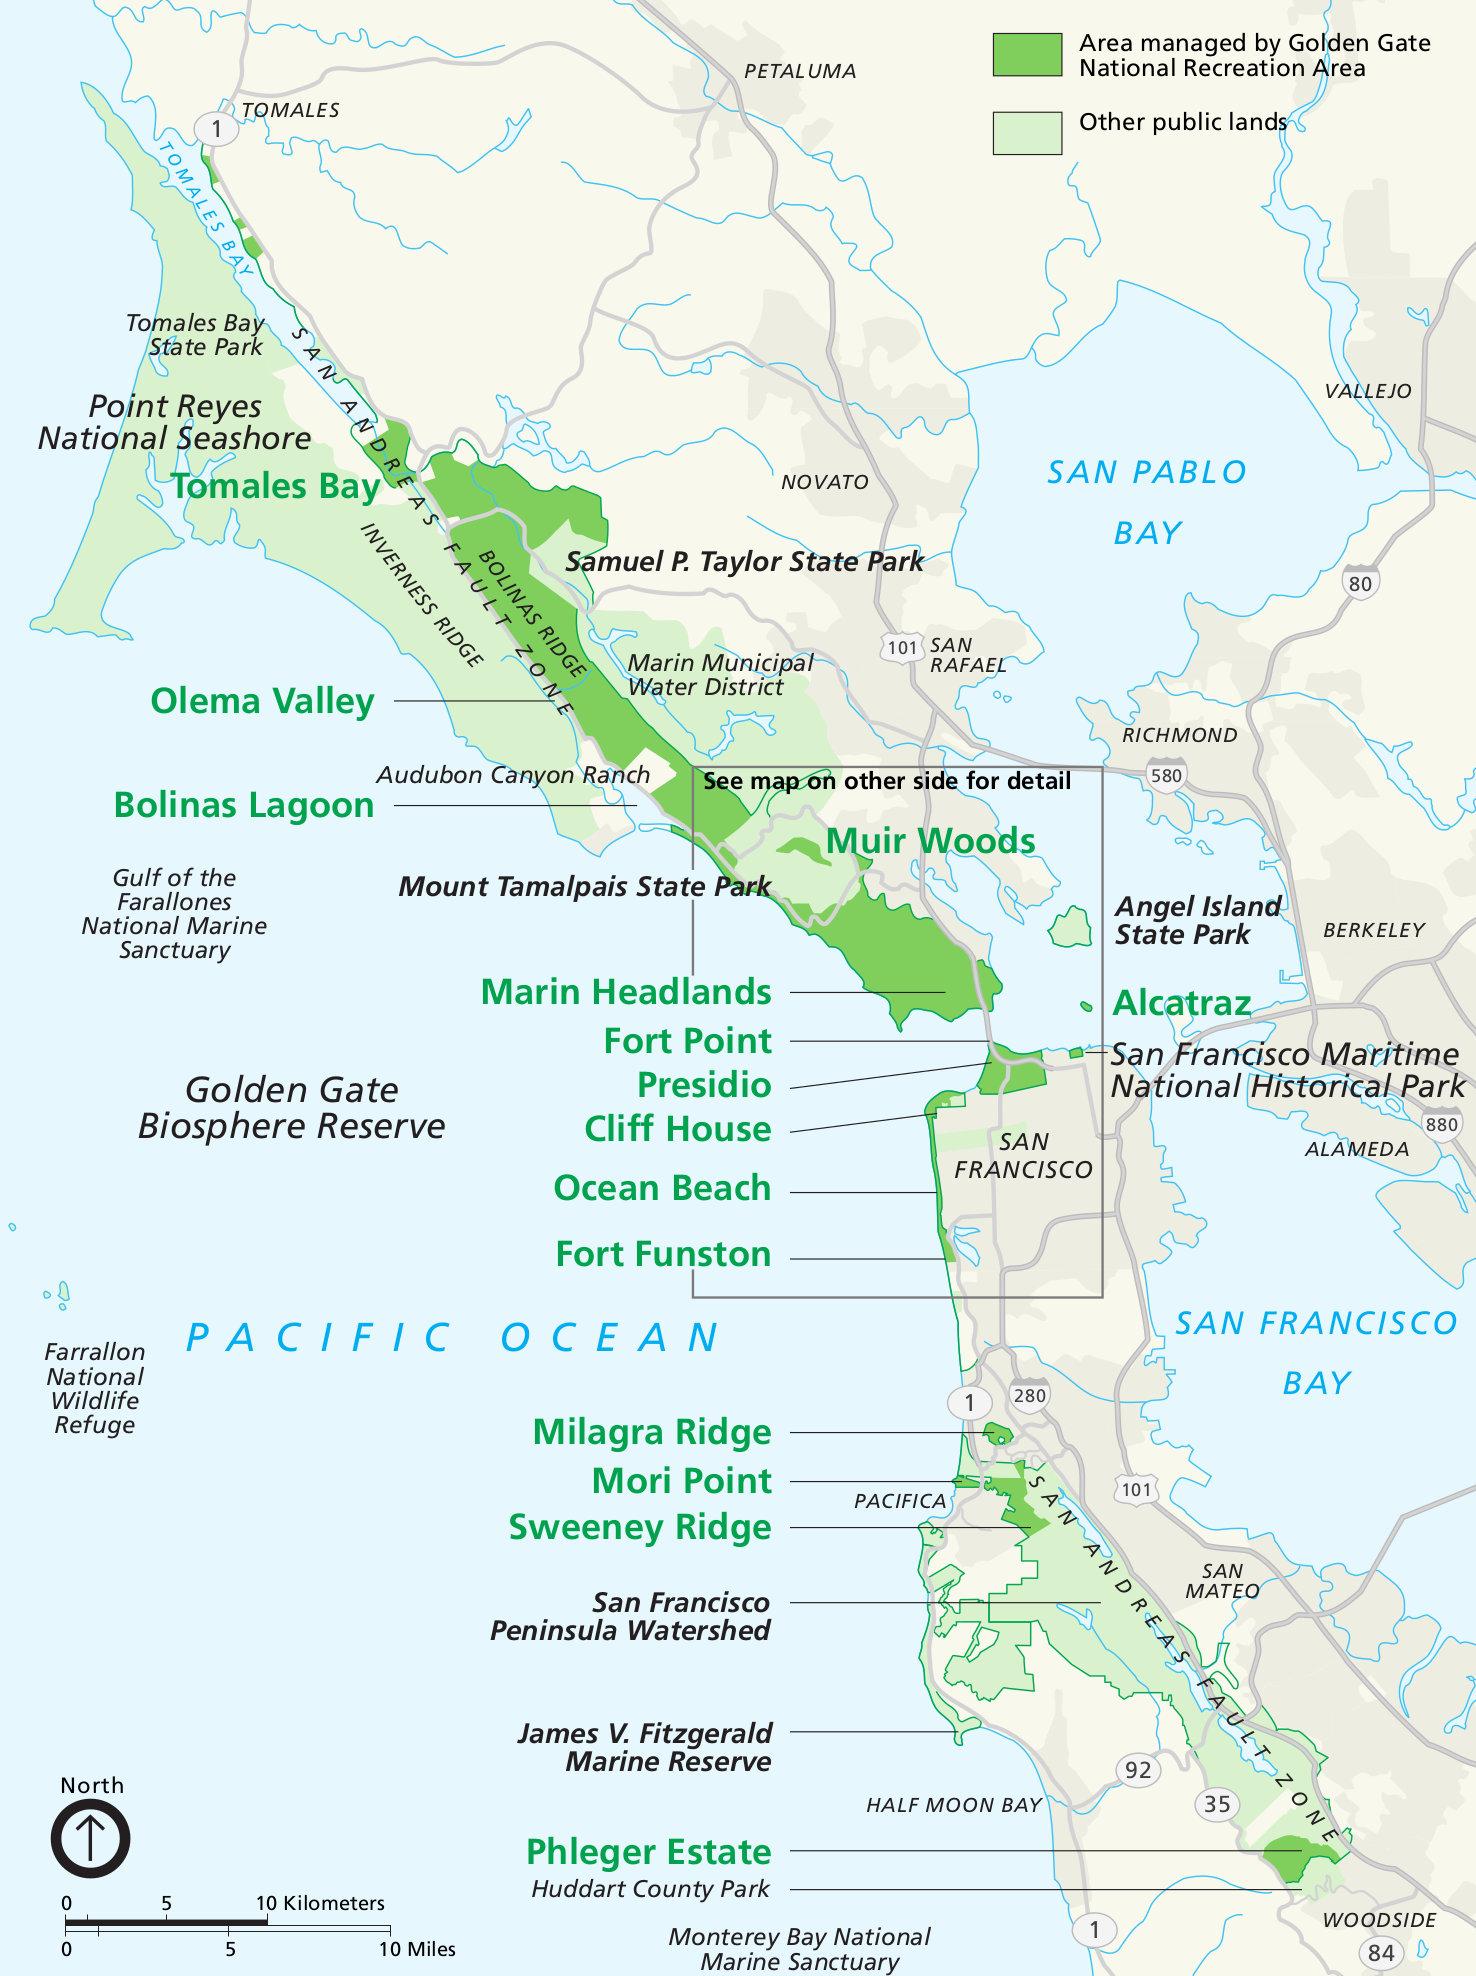 Golden Gate Maps   NPMaps.com - just free maps, period.